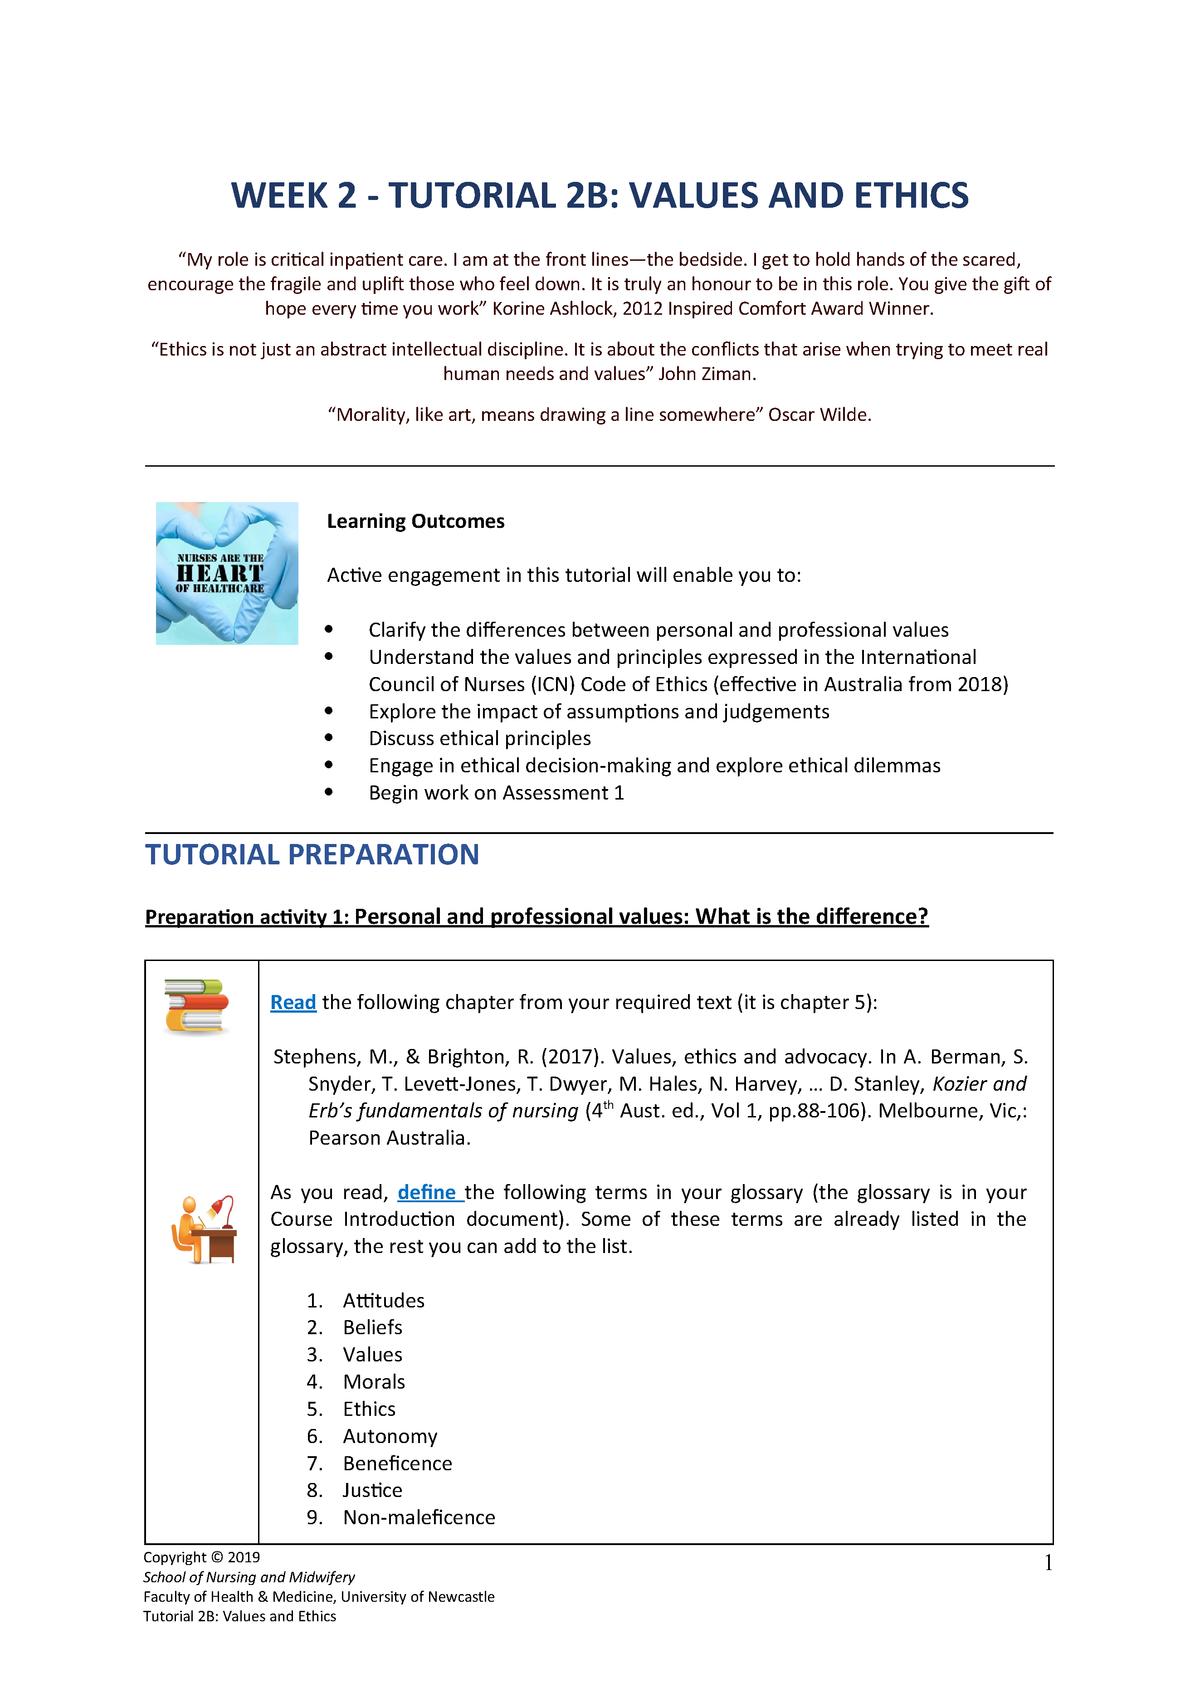 Week 2 Tutorial 2b Nursing Nurs1101 Uon Studocu